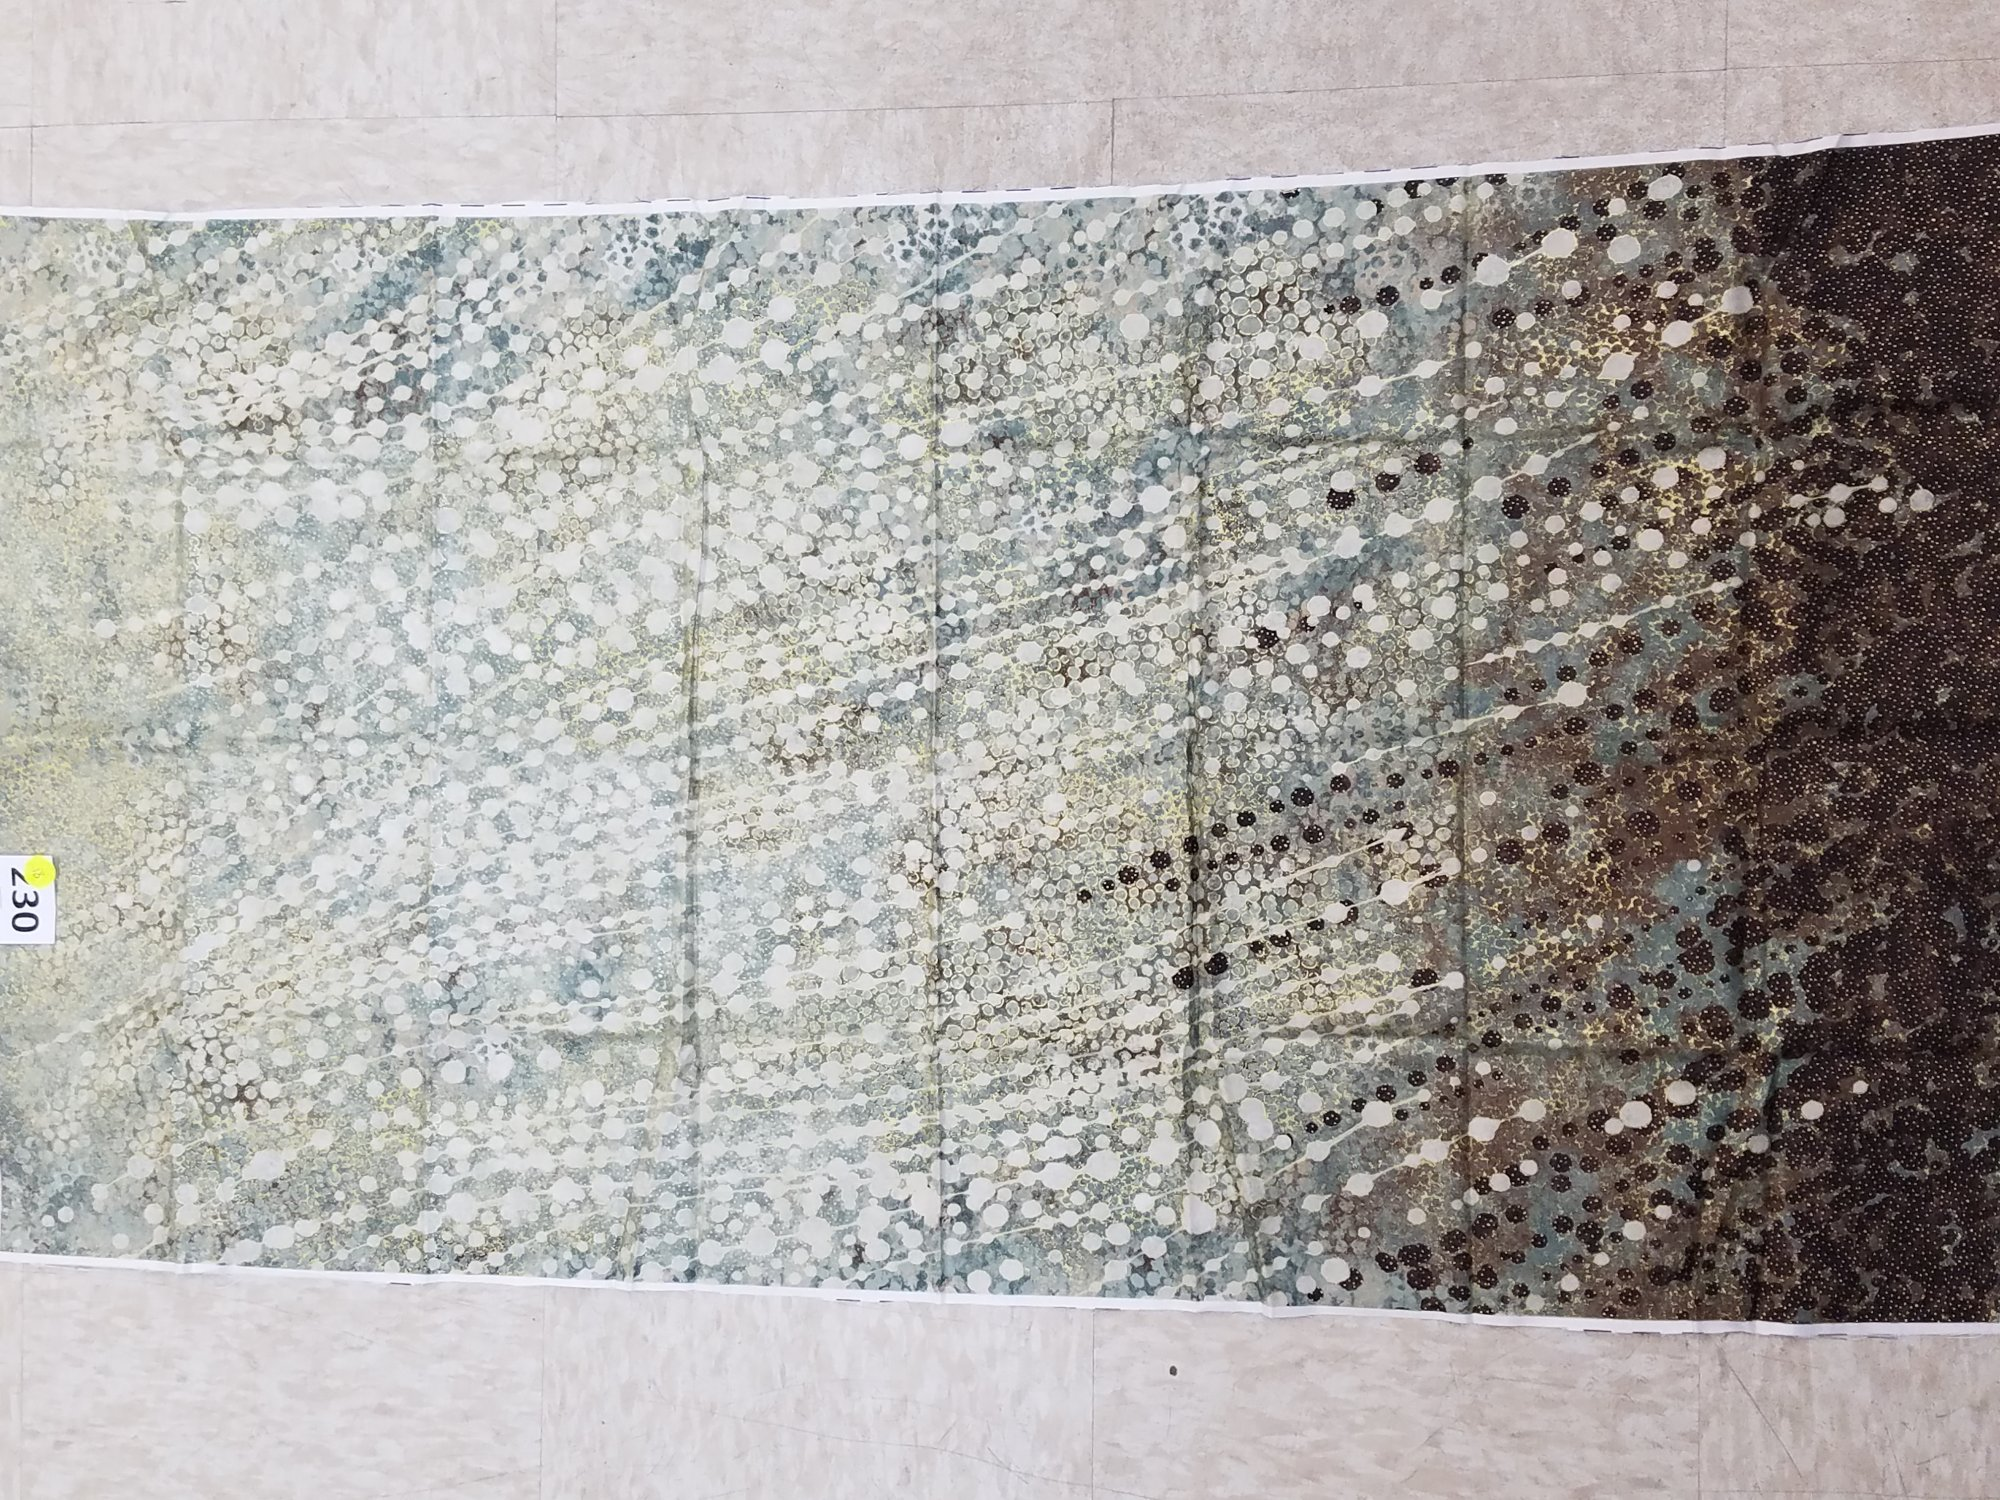 panel 230 shimmer echos green/brown